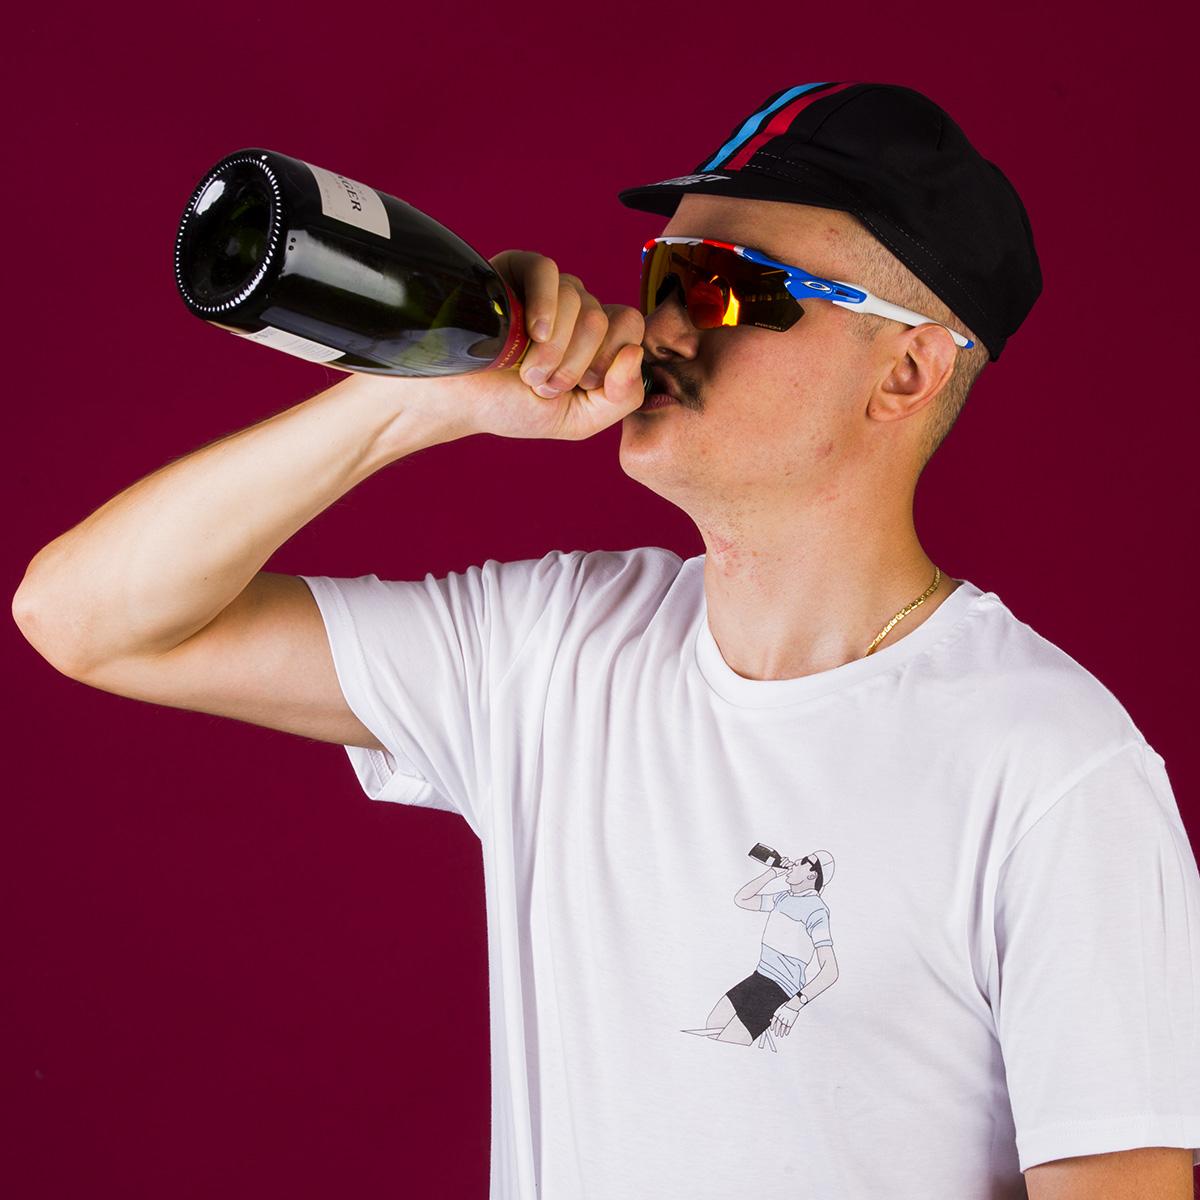 Champagne Heron swatt club